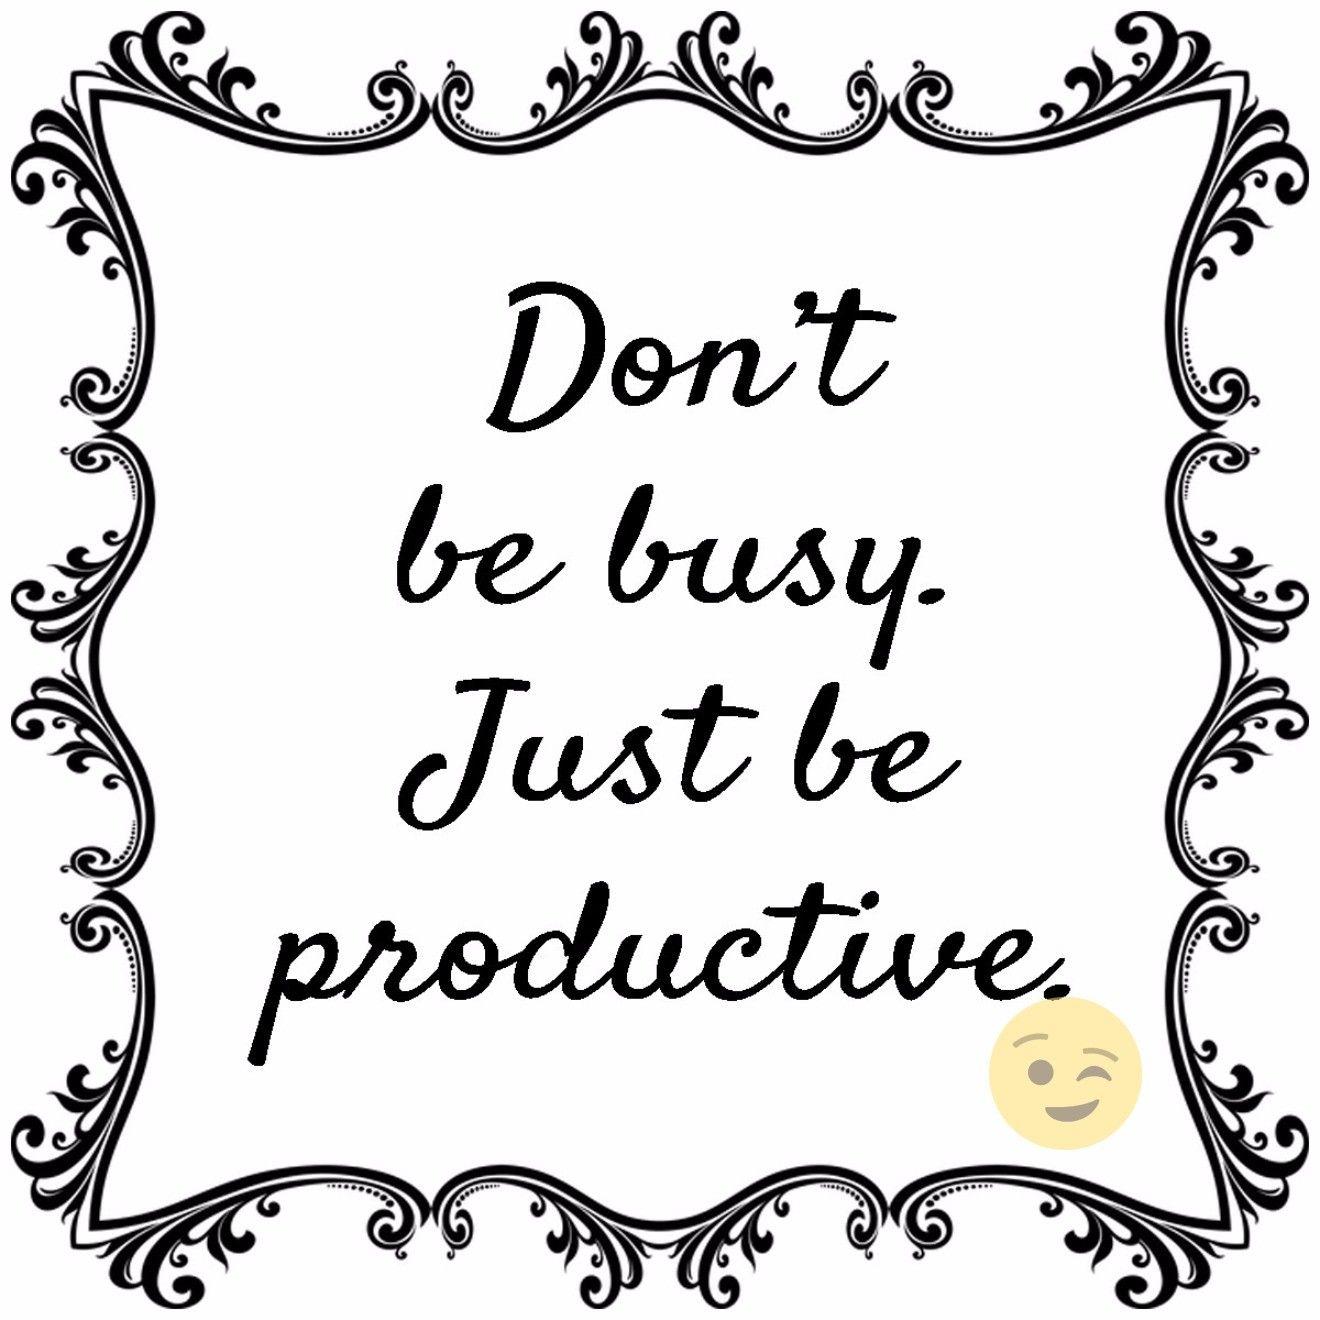 #workfromhome #changeyourlife #feelingmotivated #